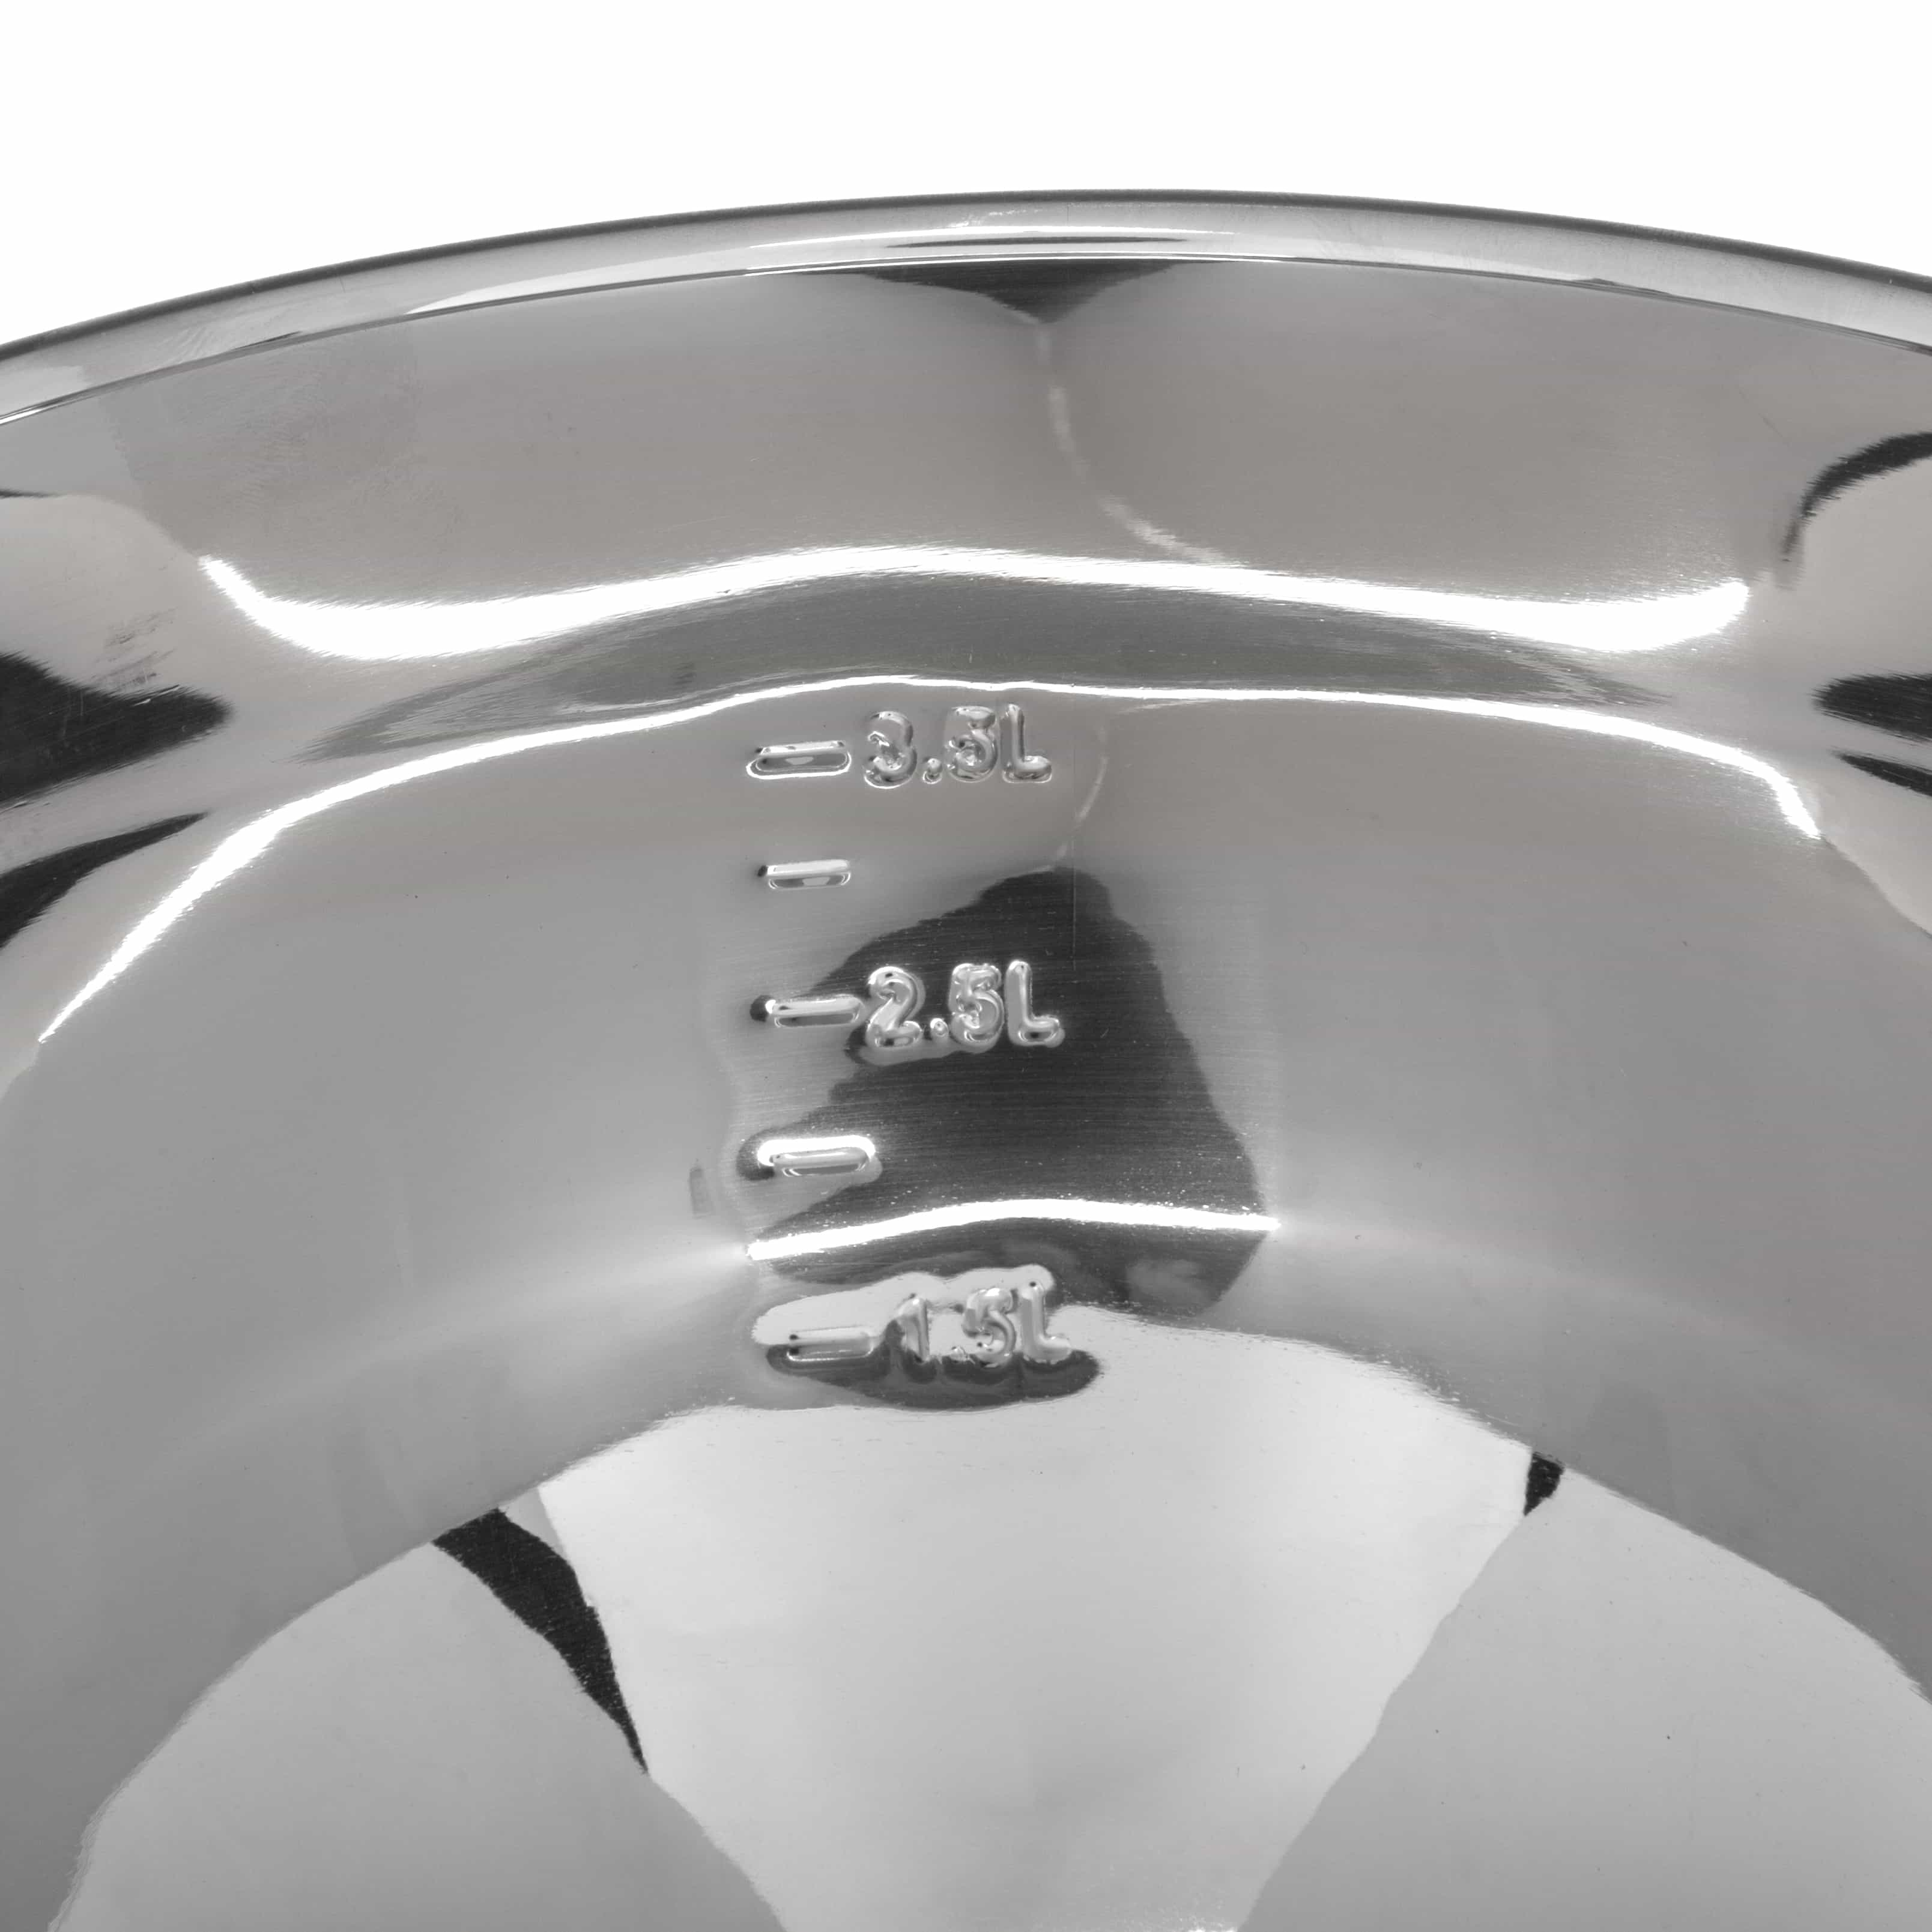 4goodz Slacentrifuge RVS inhoud 3,5L - sladroger van RVS